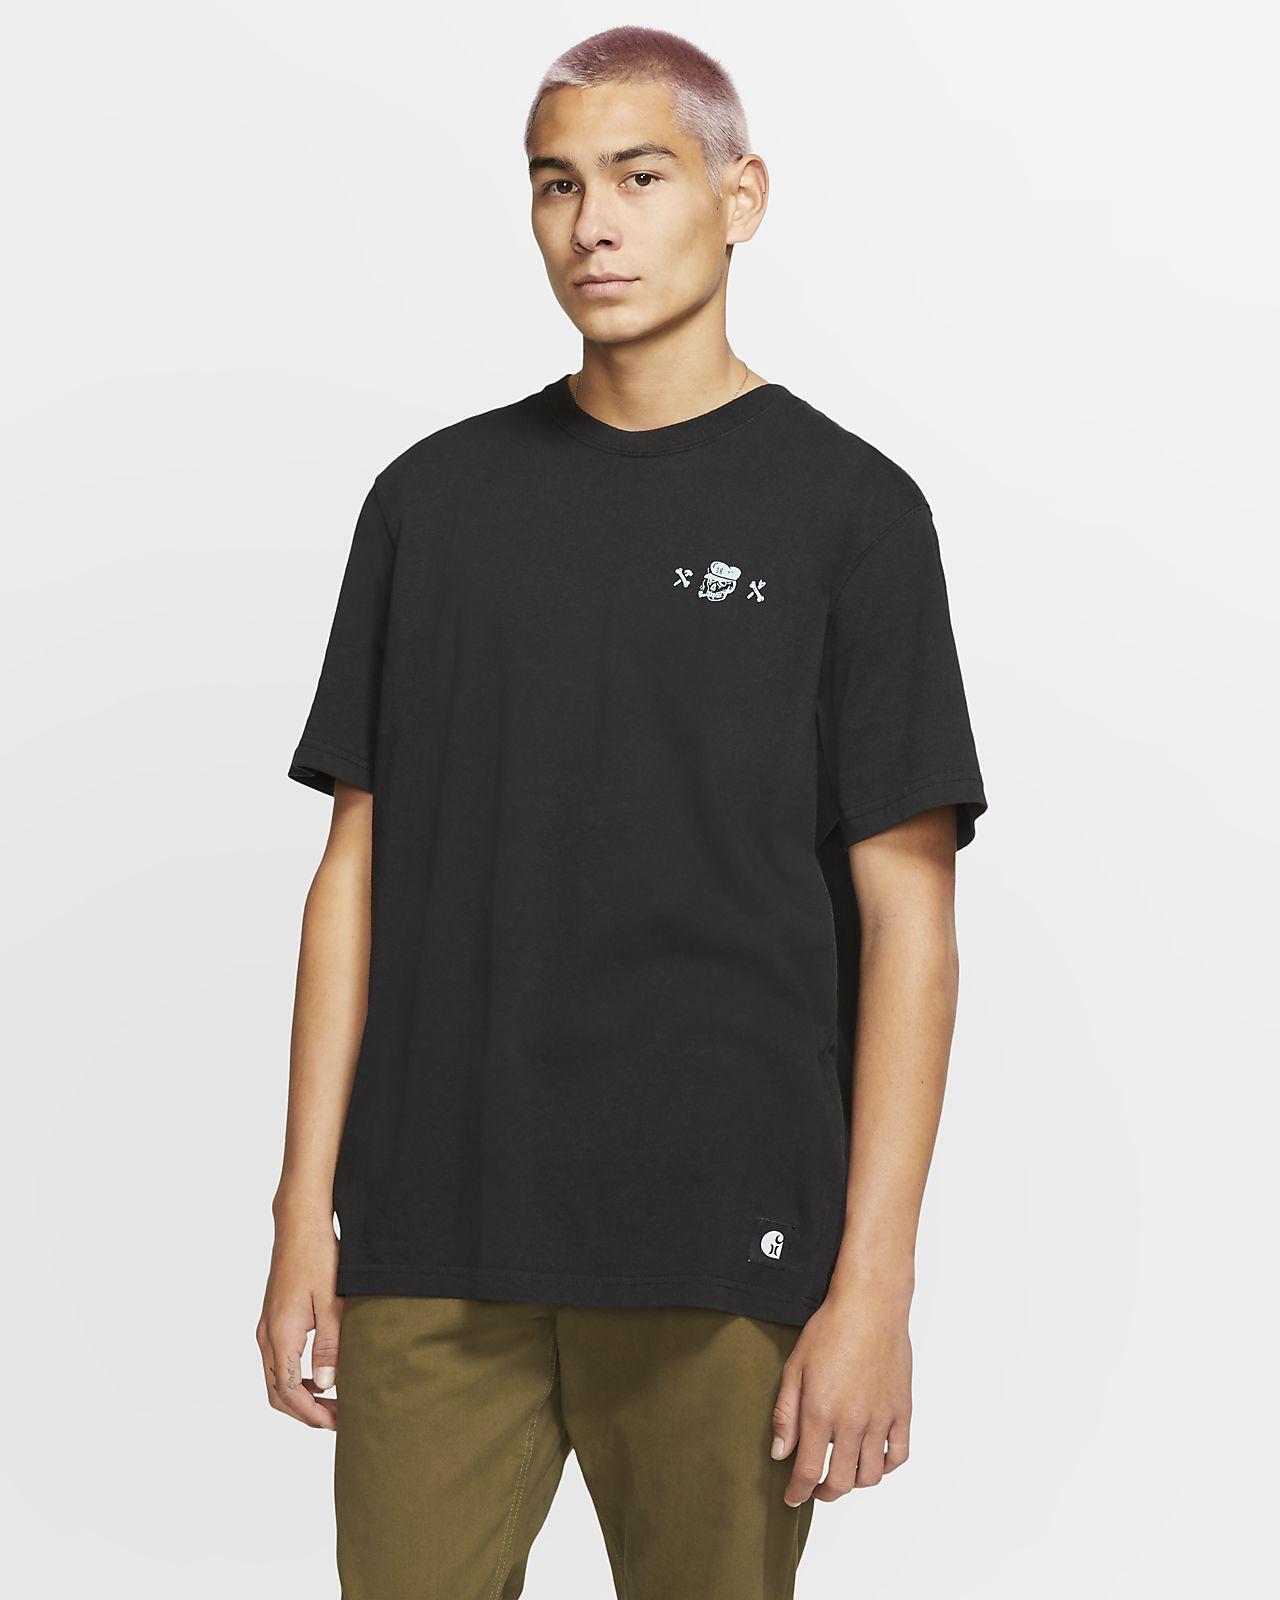 Hurley x Carhartt Handcrafted Men's T-Shirt